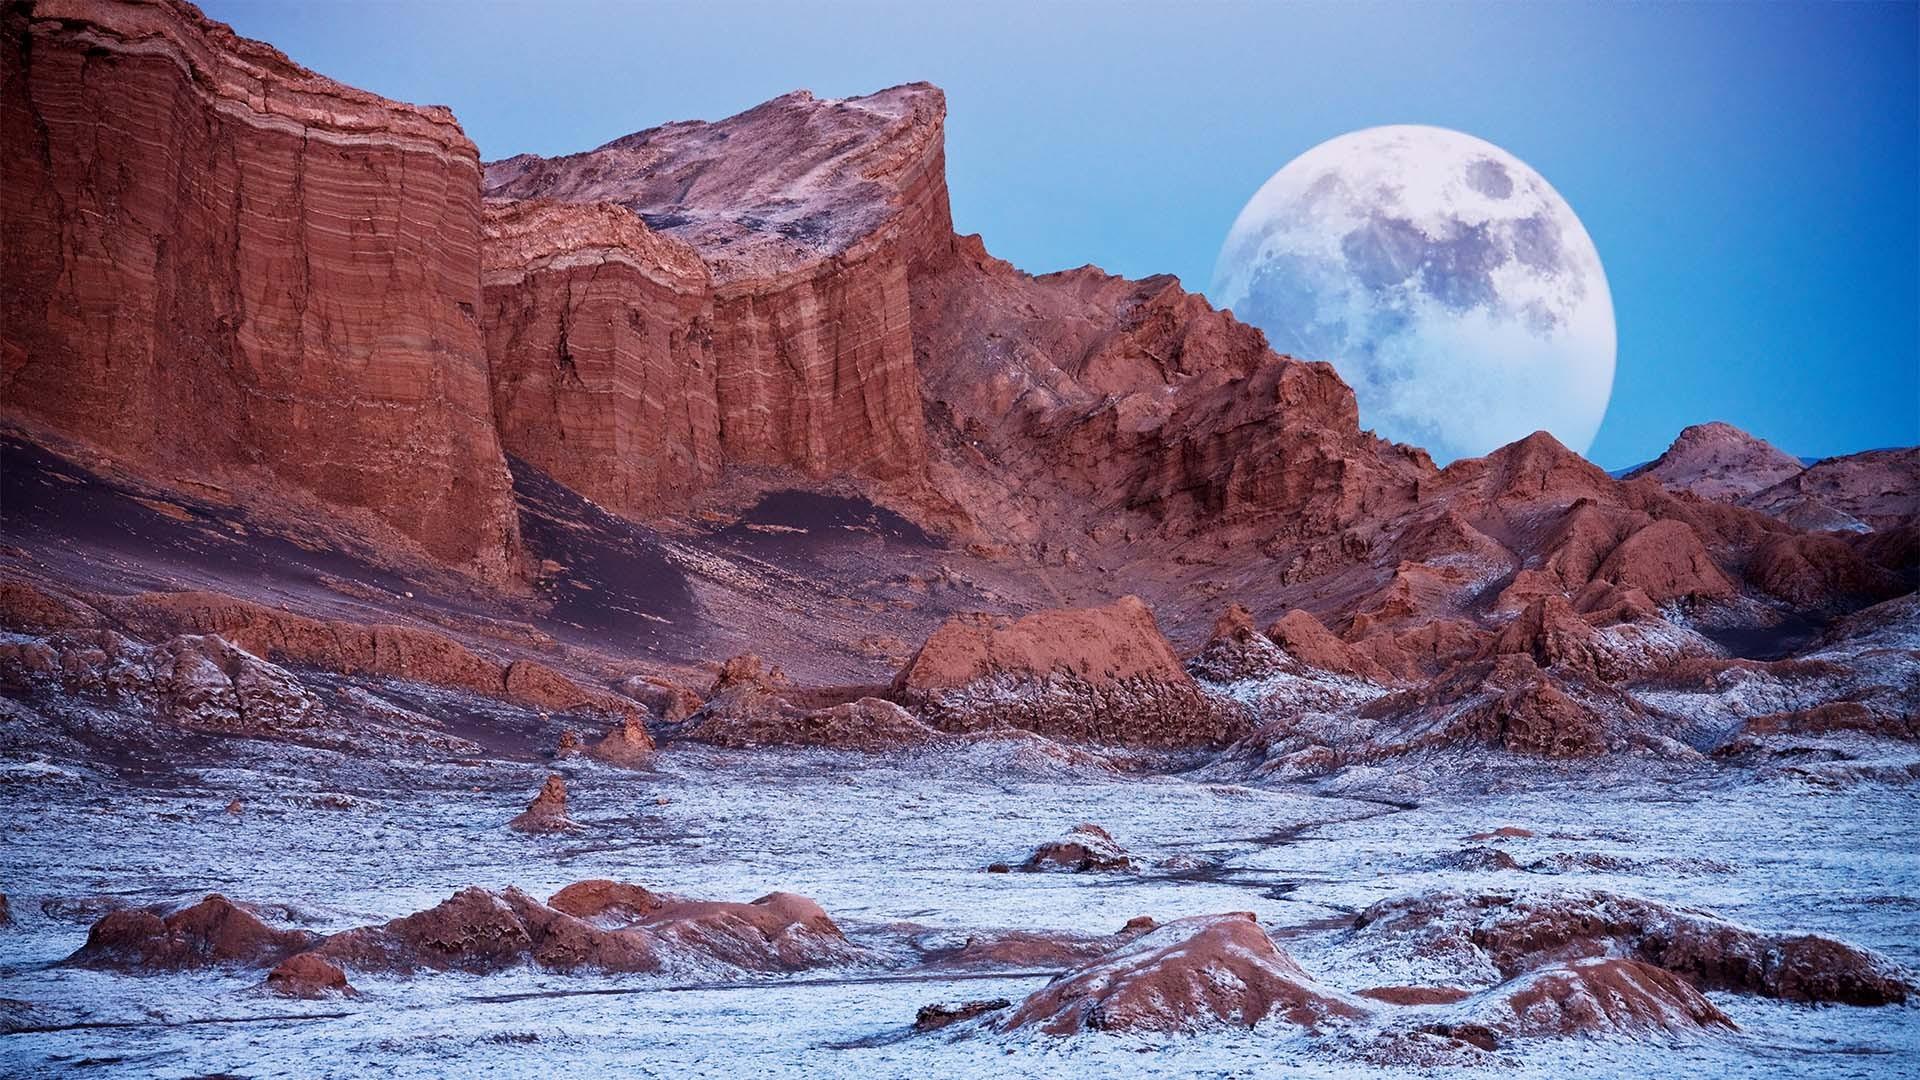 Supermoon in the Atacama Desert, Chile